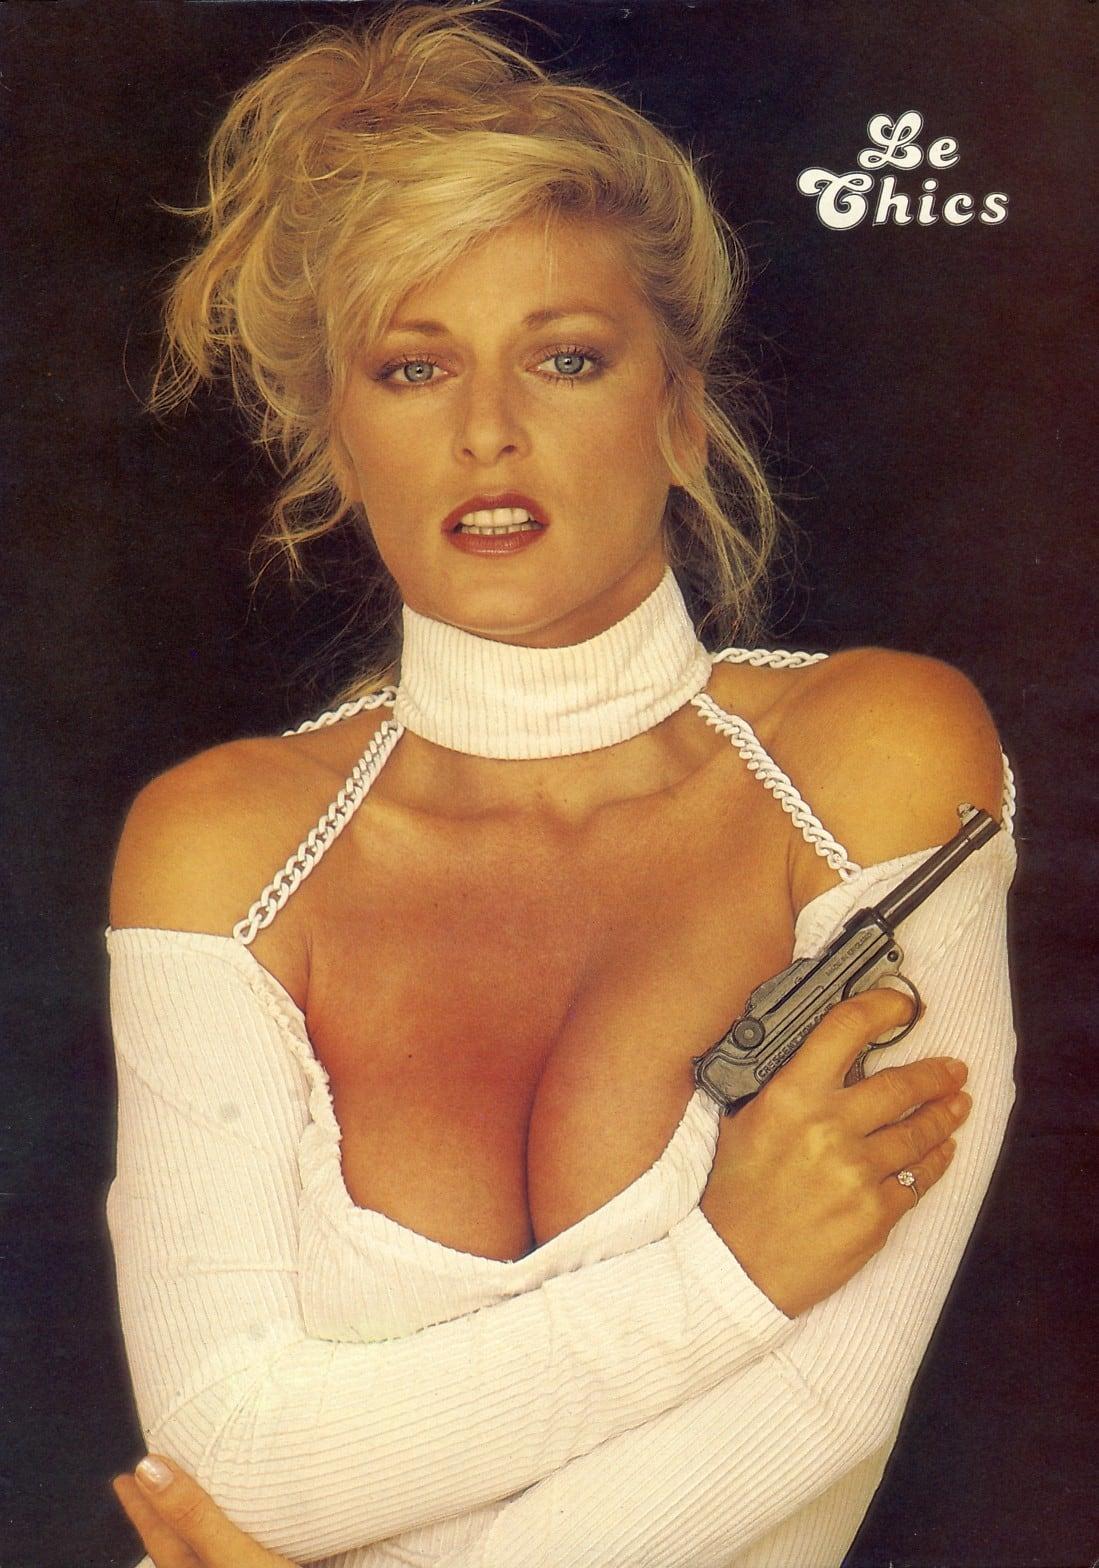 Lucinda Jenney Sex pics & movies Helen McCrory,Harvey Spencer Stephens (born 1970)